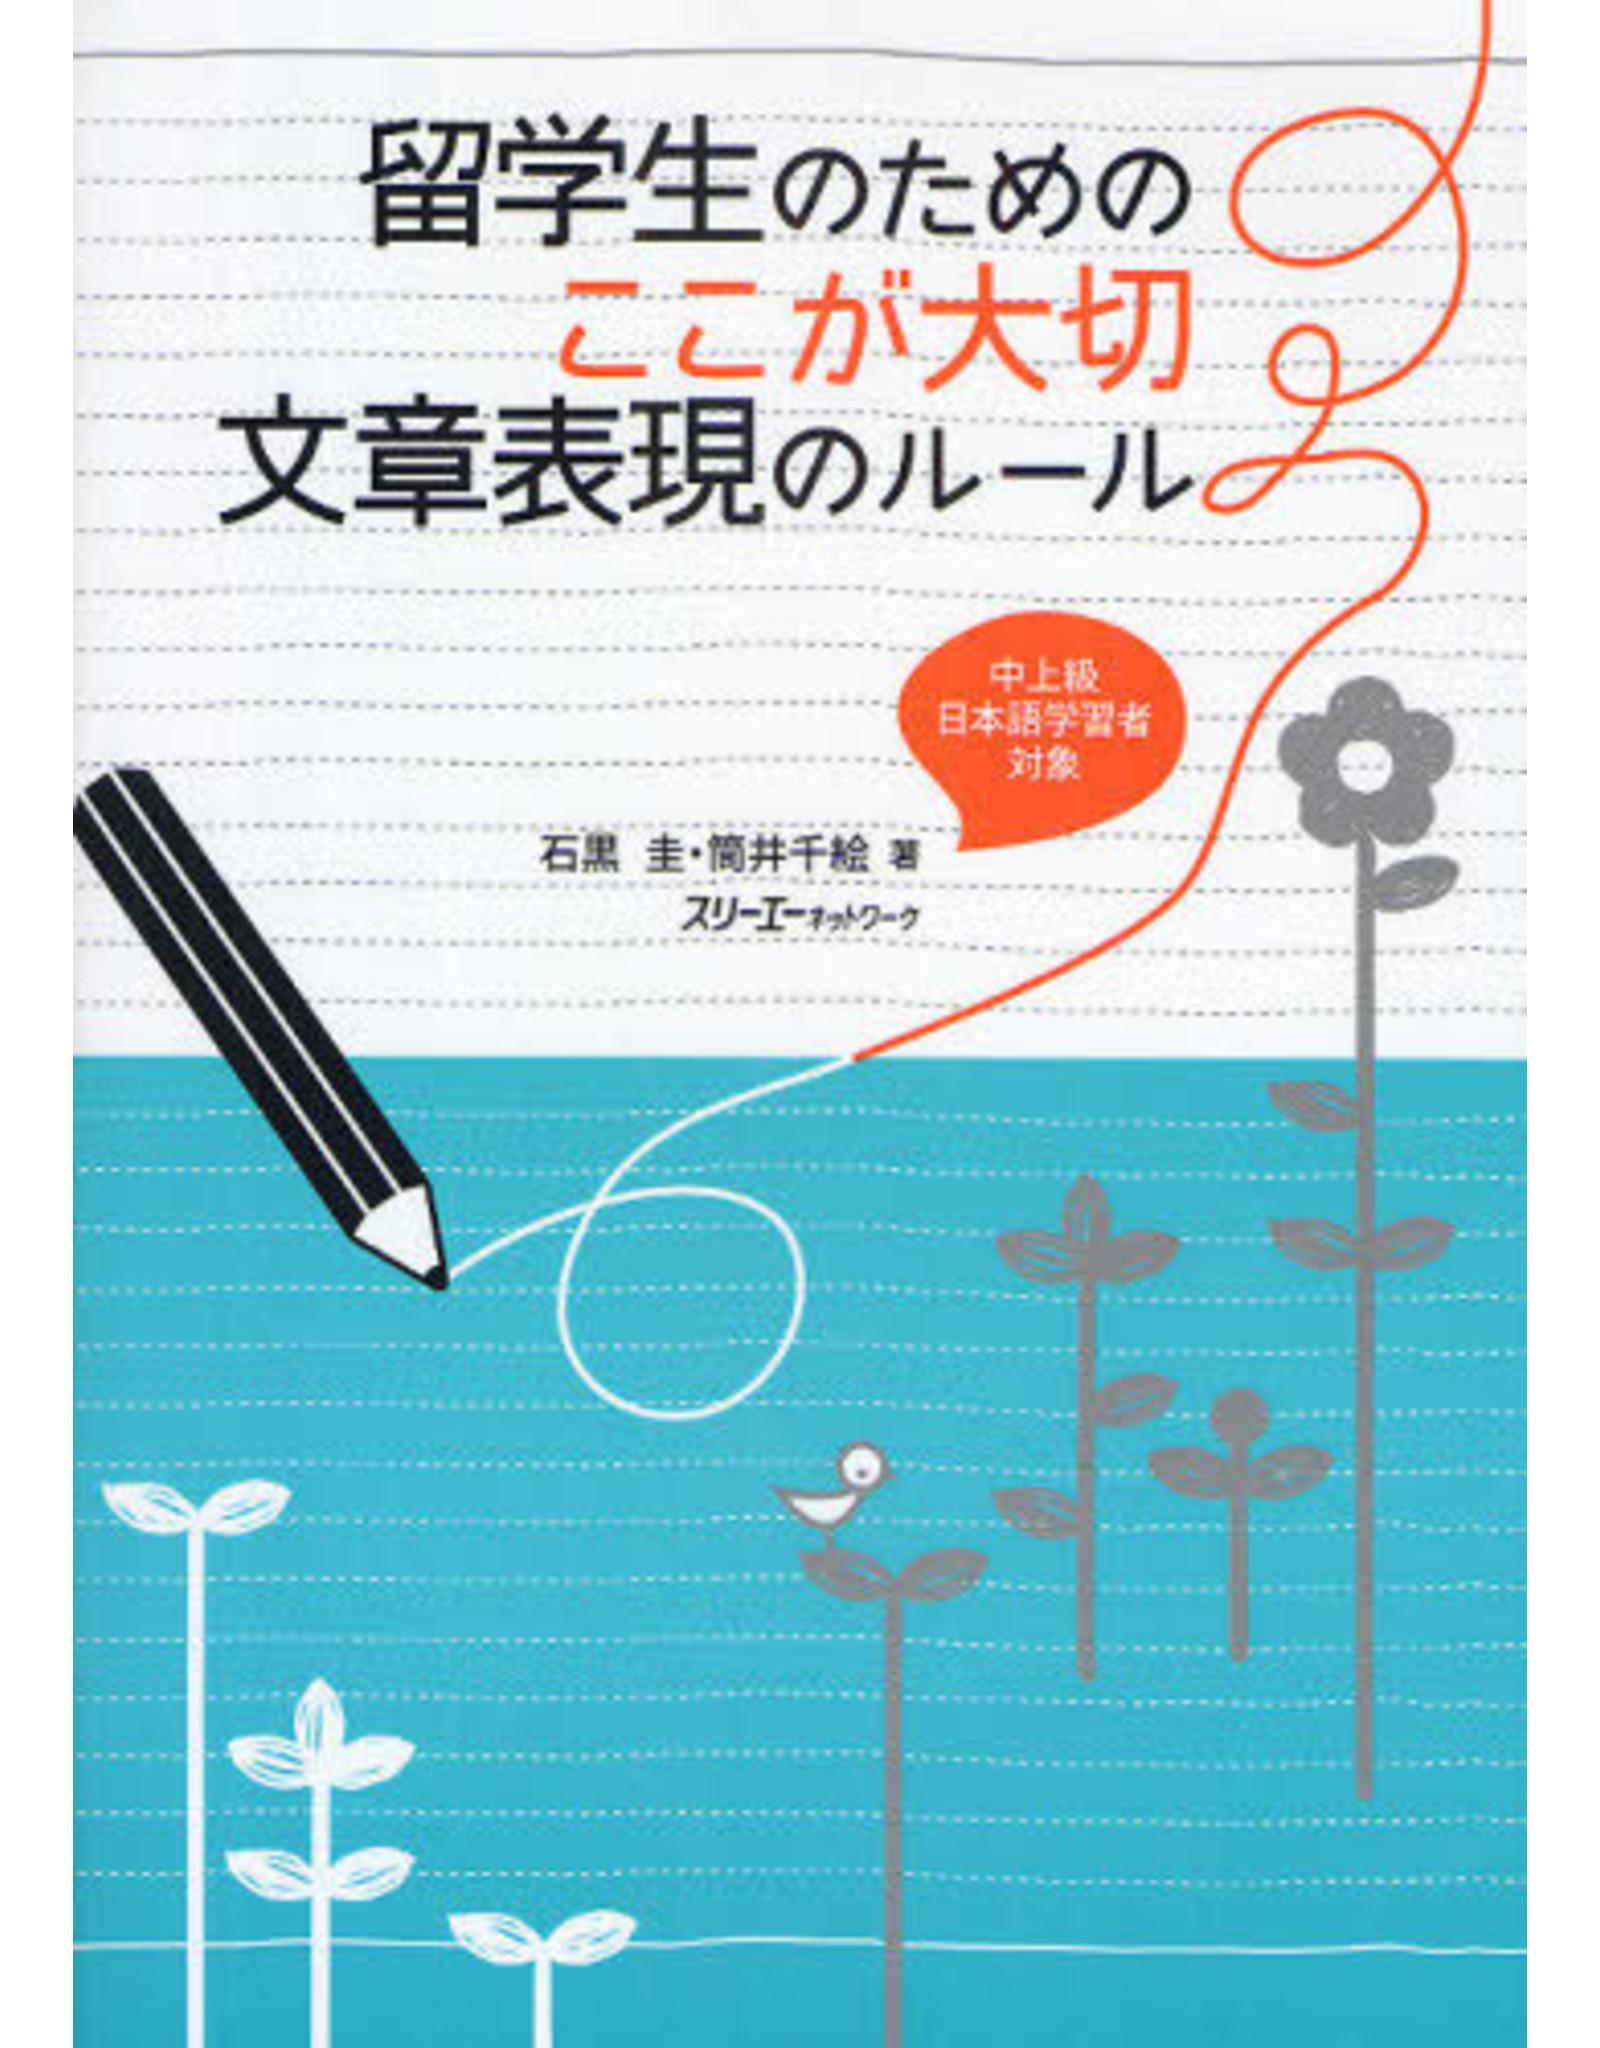 3A Corporation RYUGAKUSEI/ BUNSHOU HYOUGEN NO RULE